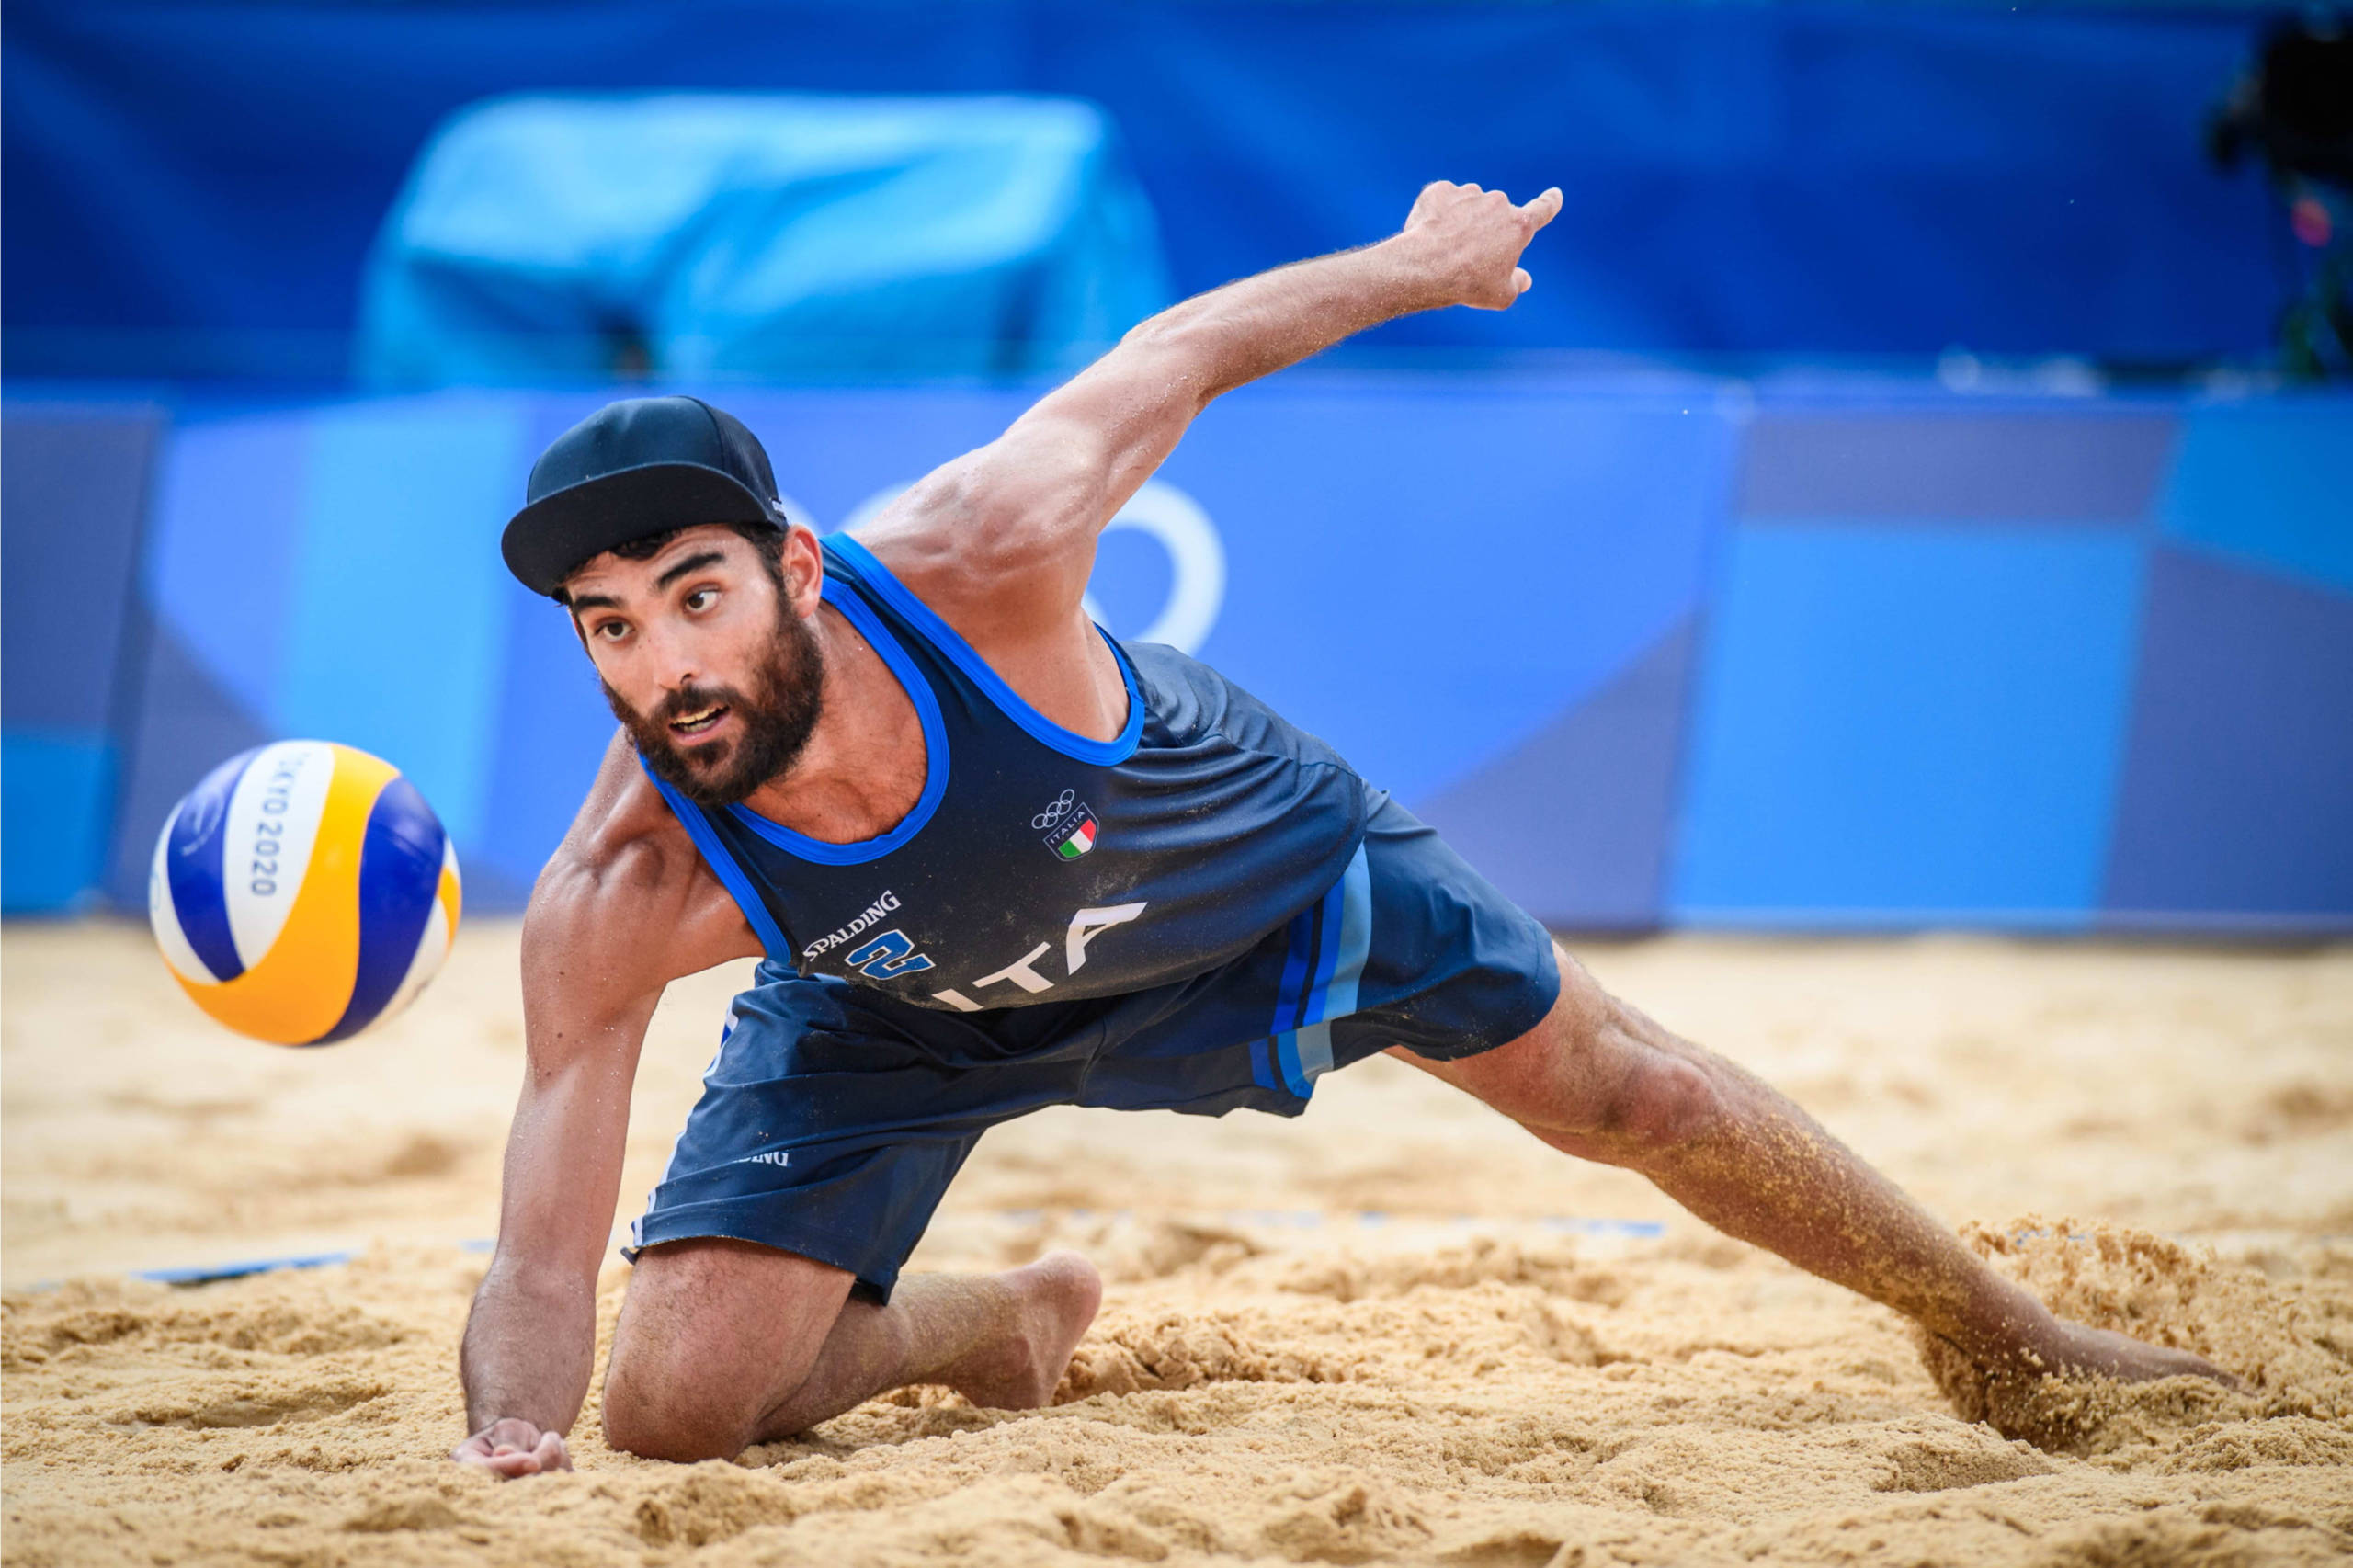 Beach volley, Olimpiadi Tokyo. Battuti 2 0 Fijalek/Bryl, Nicolai/Lupo puntuali all'appuntamento con i quarti